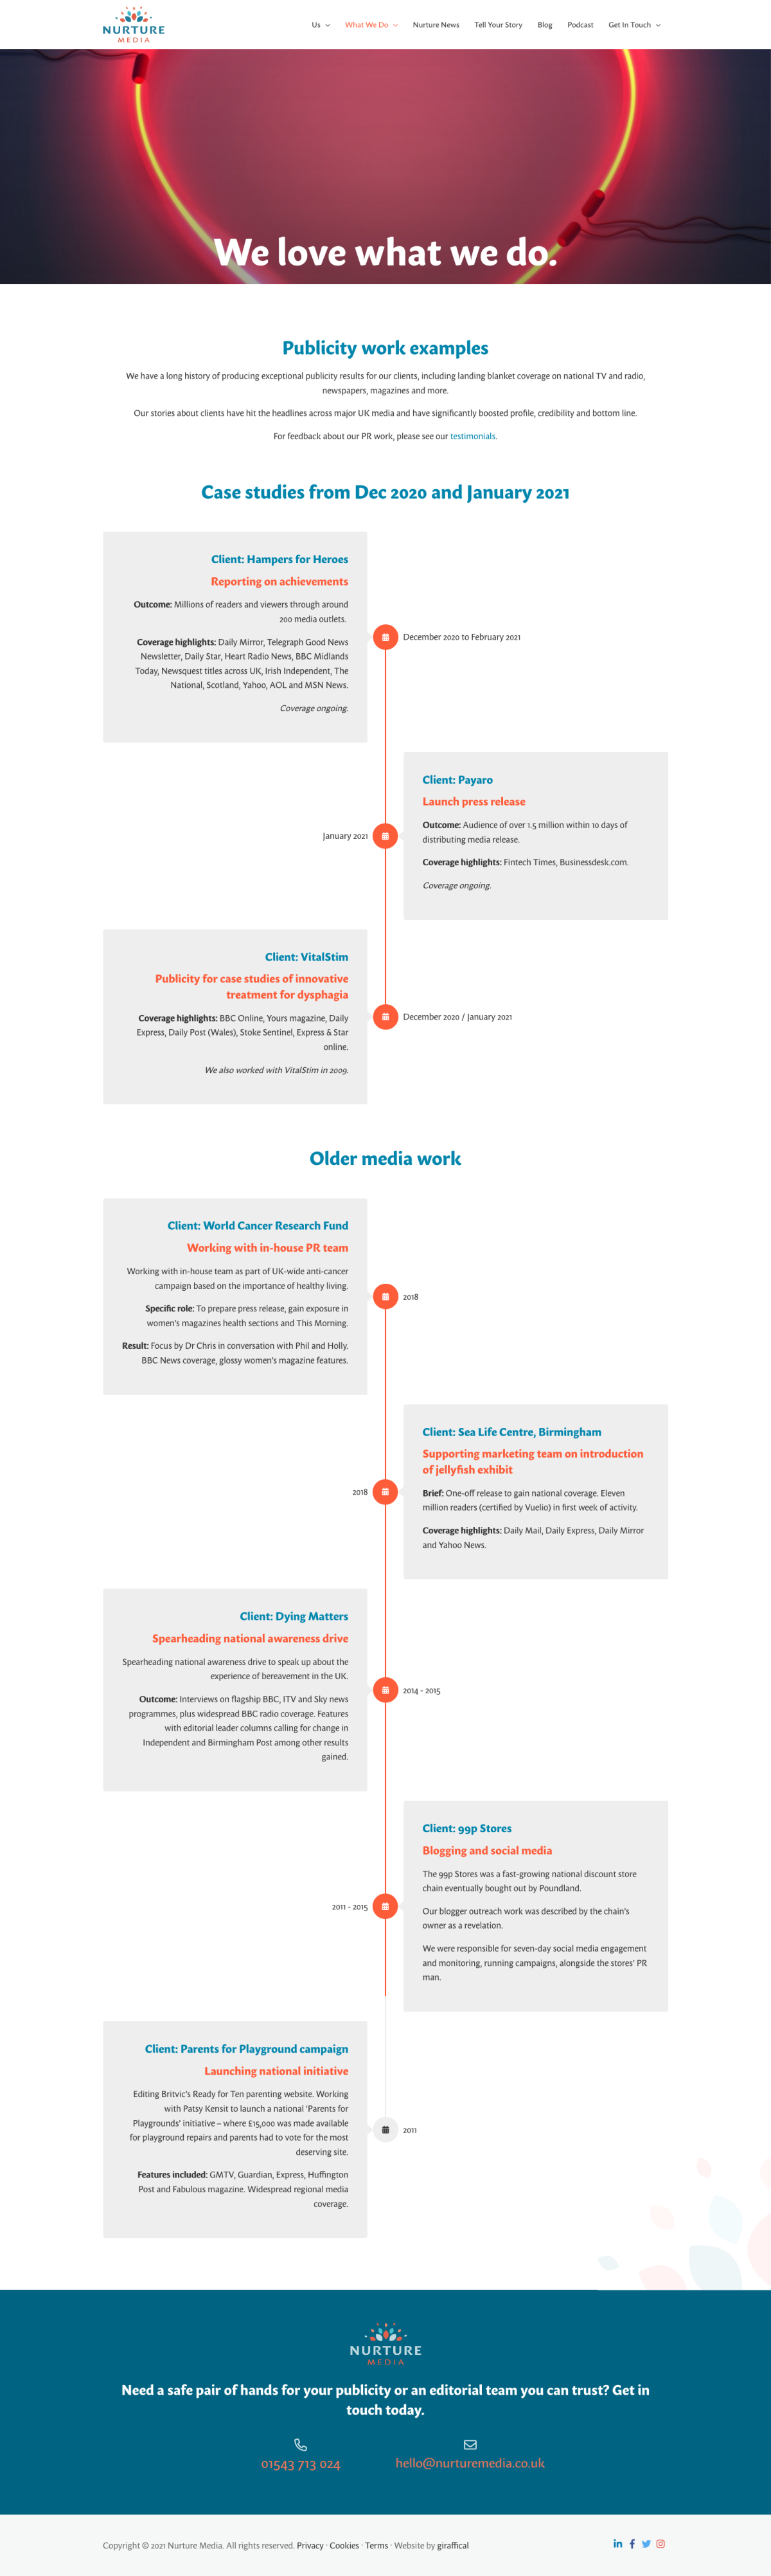 PR Publicity Agency Website Design - Nurture Media - Case Studies Page